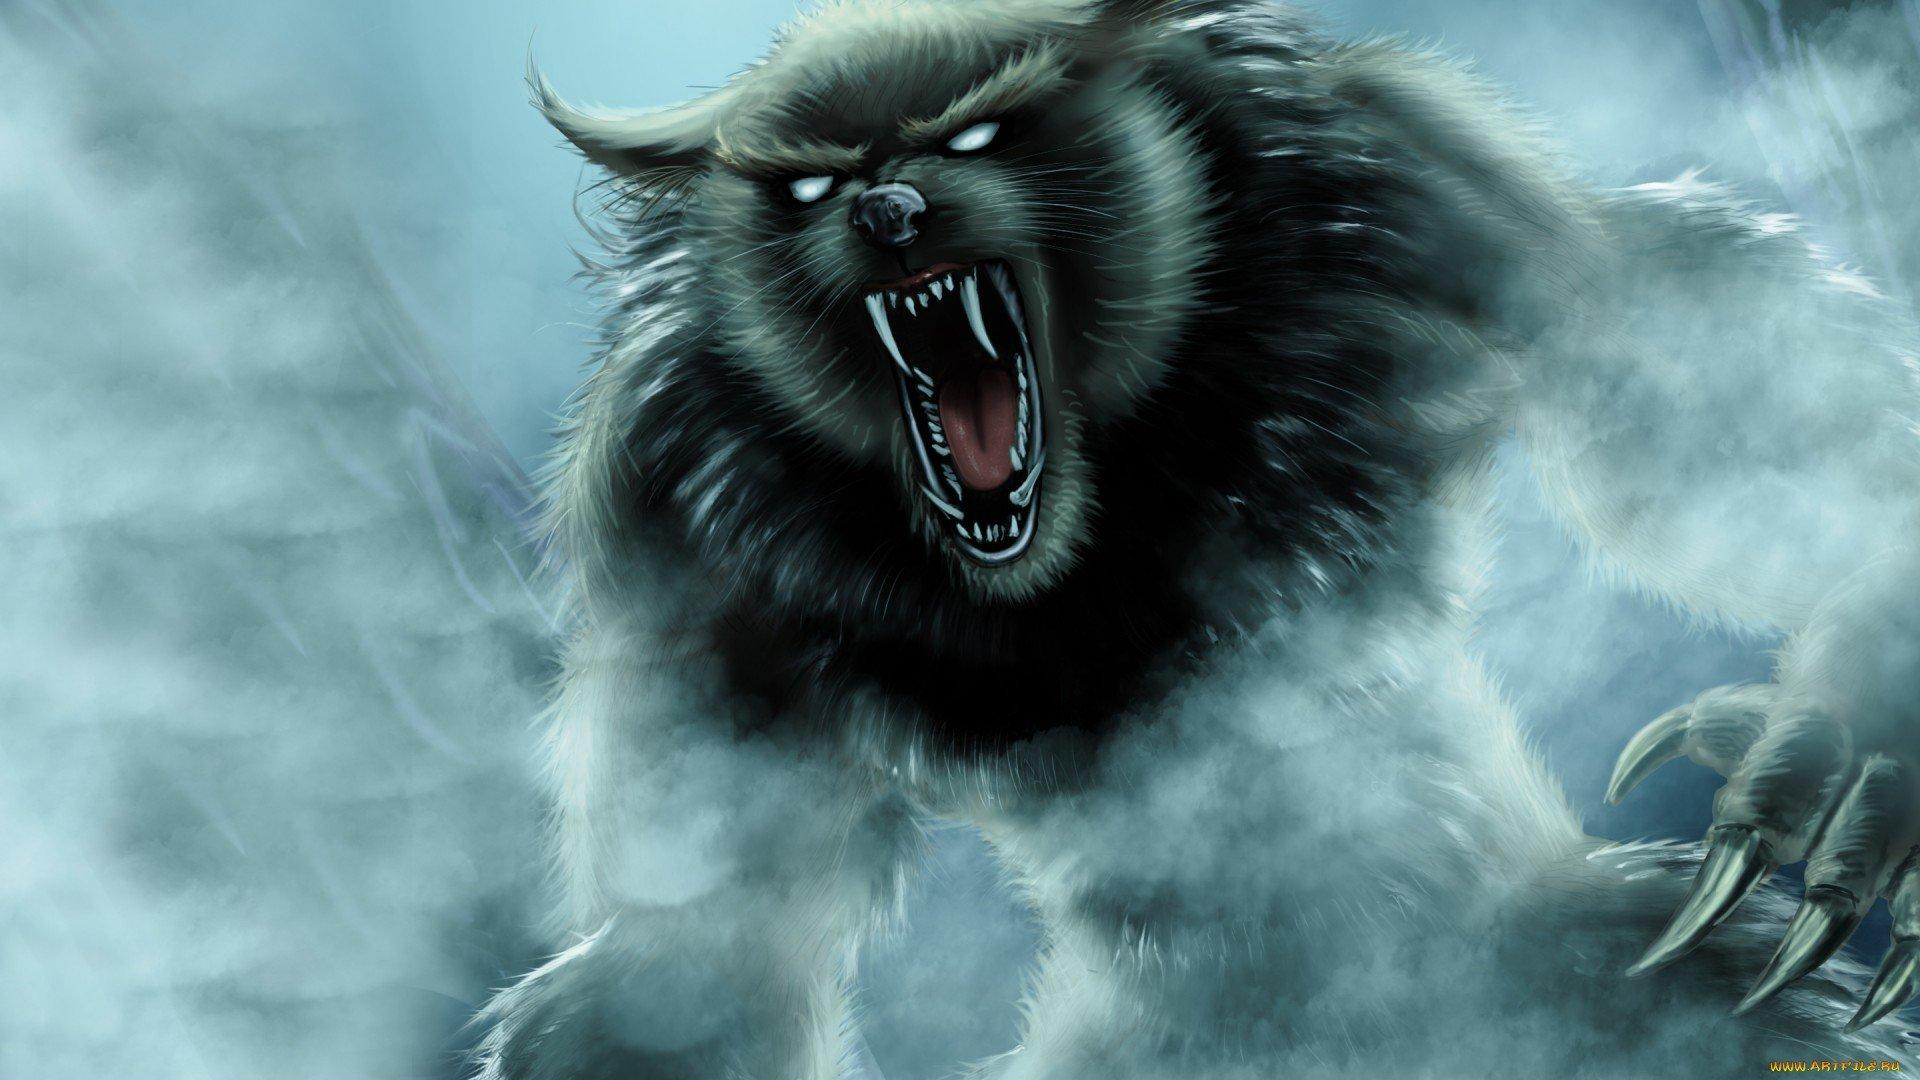 High Resolution Wallpaper | Werewolf 1920x1080 px